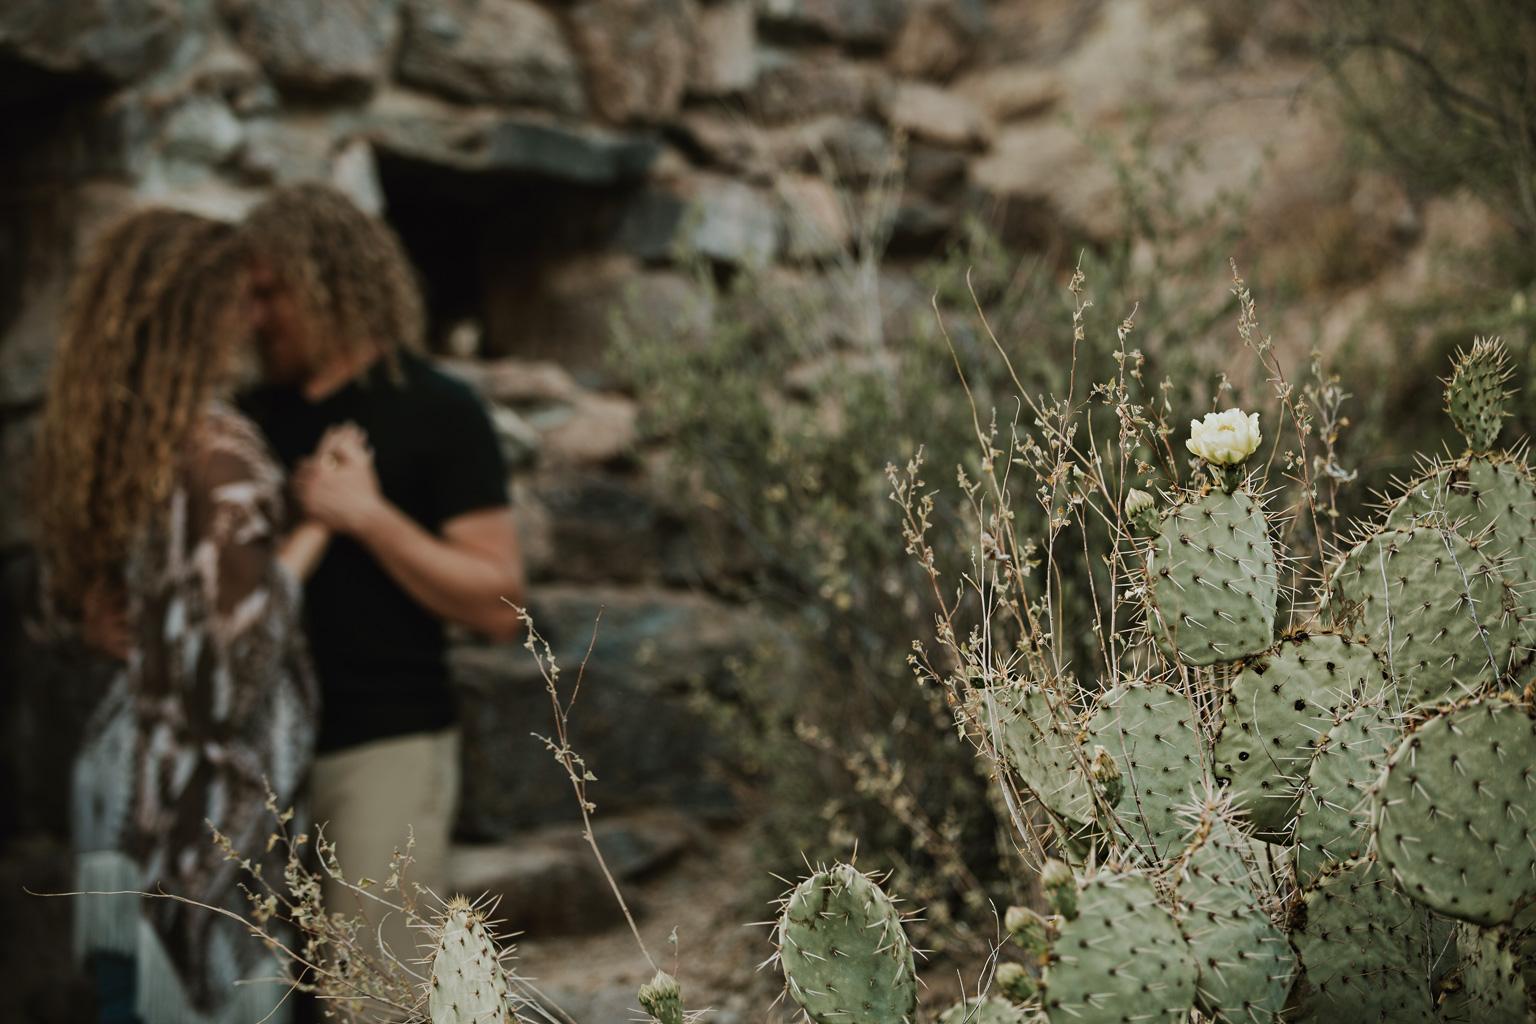 CindyGiovagnoli_Tucson_Arizona_engagement_lifestyle_portrait_Airstream_Excella_travel_trailer_camper_Saguaro_National_Park-018.jpg